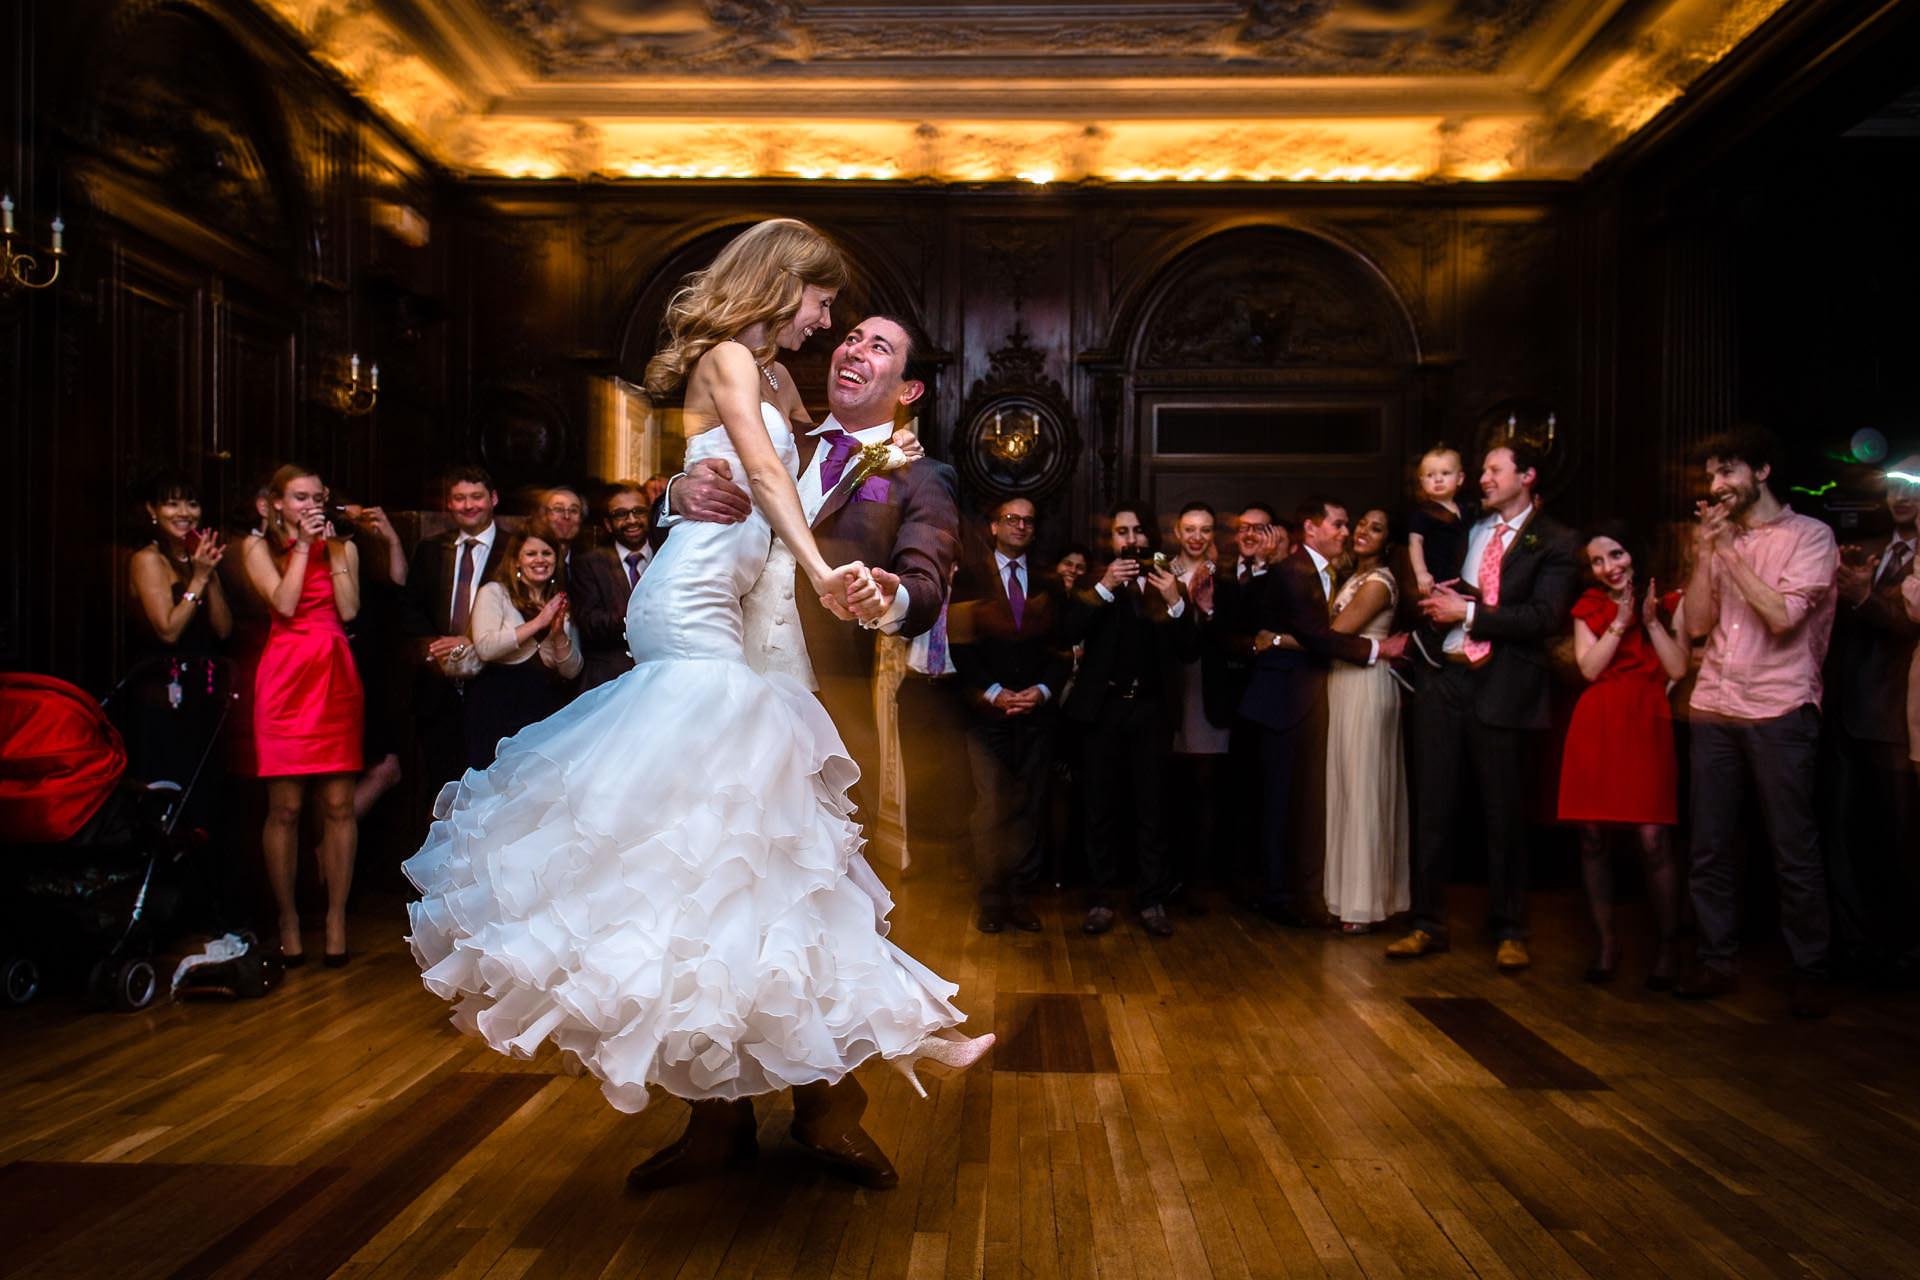 first dance at wedding in London - groom is looking in the eyes of bride